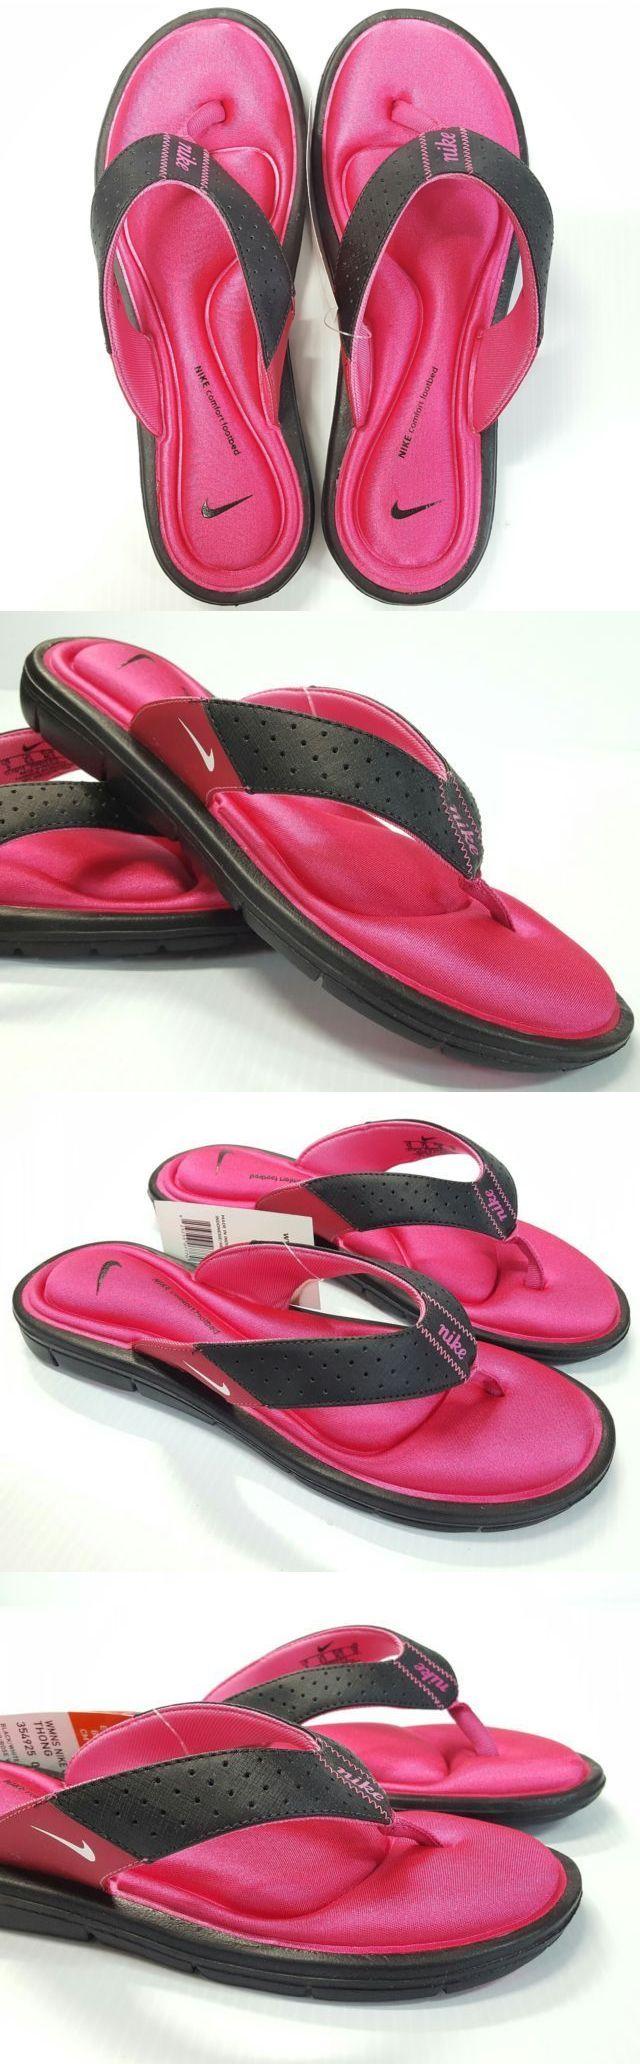 Sandals and Flip Flops 62107: Nike Women S Comfort Thong Sandals Flip-Flops Color Black-Pink Size 7,8 Or 9 -> BUY IT NOW ONLY: $33.99 on eBay!